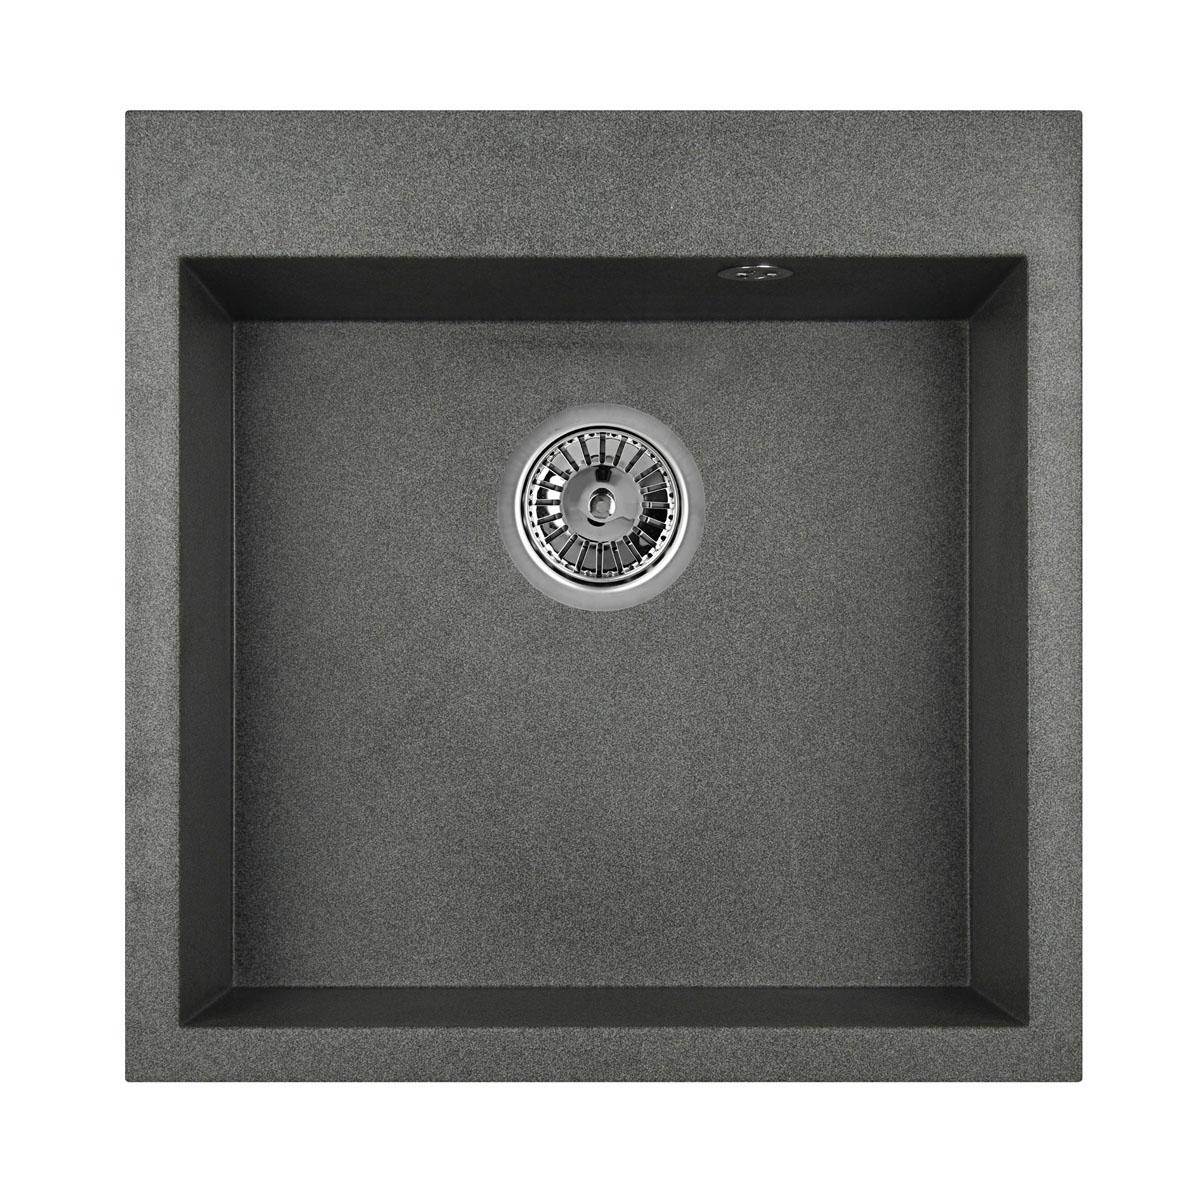 Кухонная мойка Granula GR-5102 505х510 графит цена